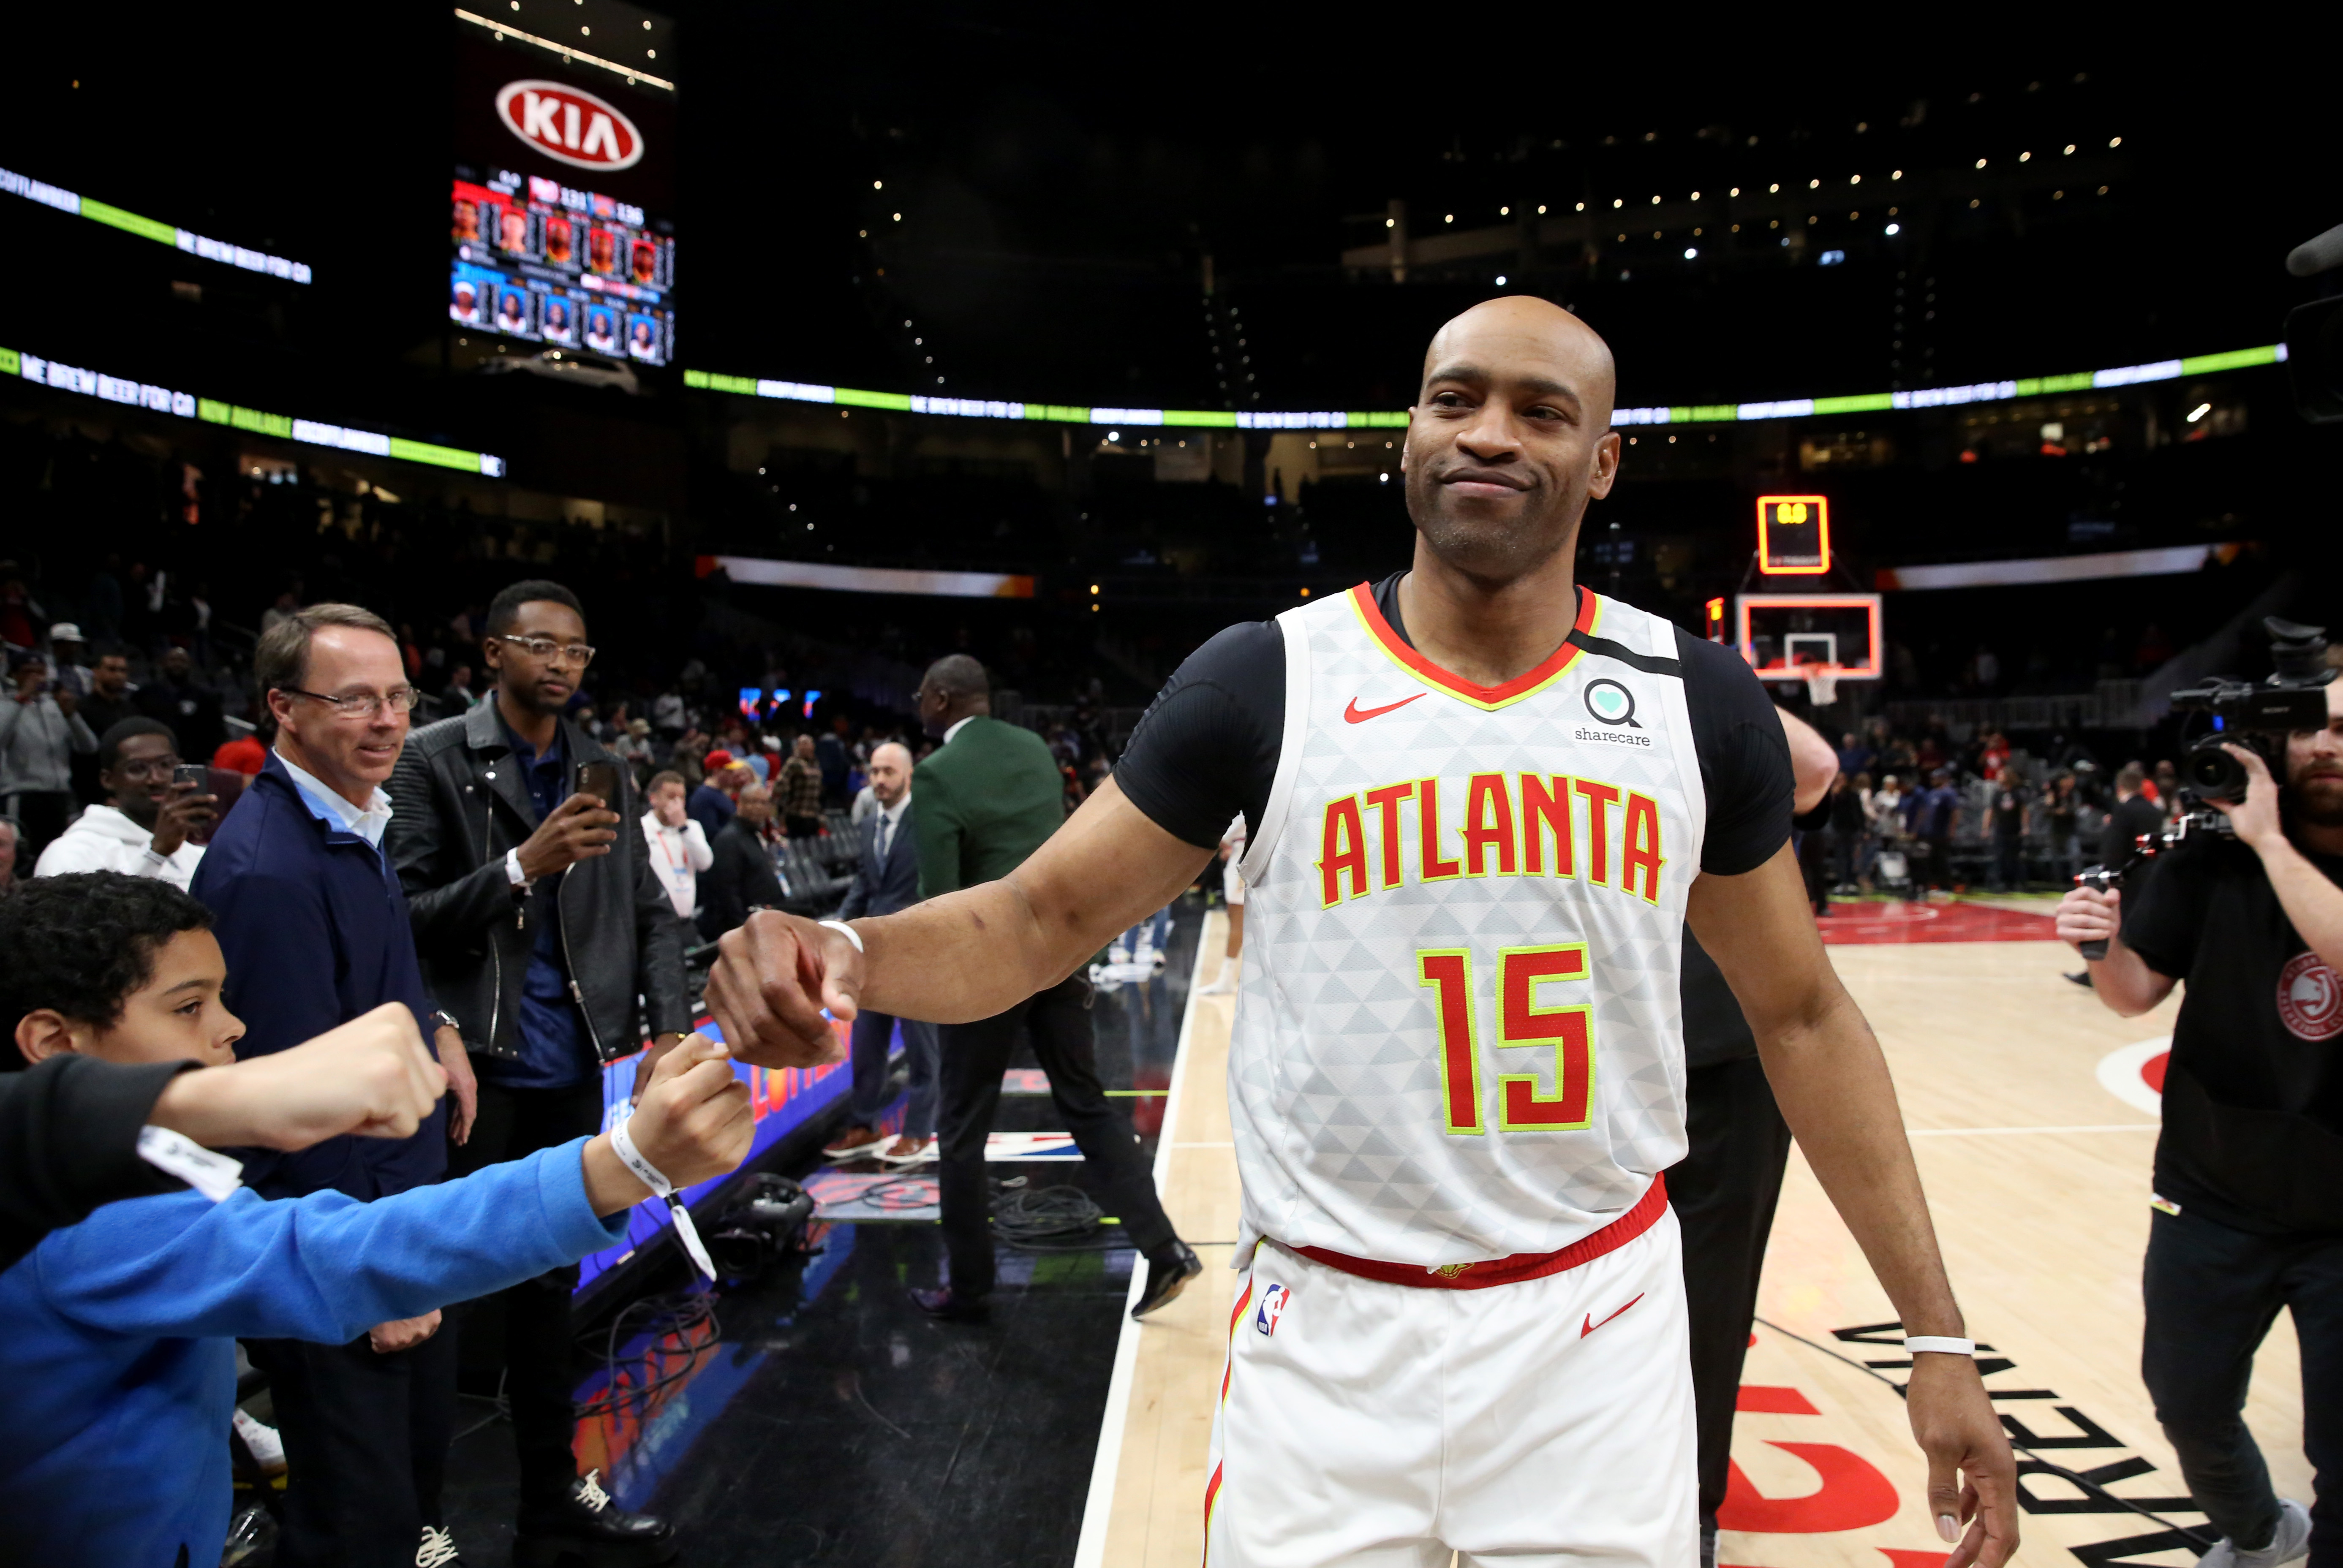 3 NBA Teams to Watch in the Next Few Seasons